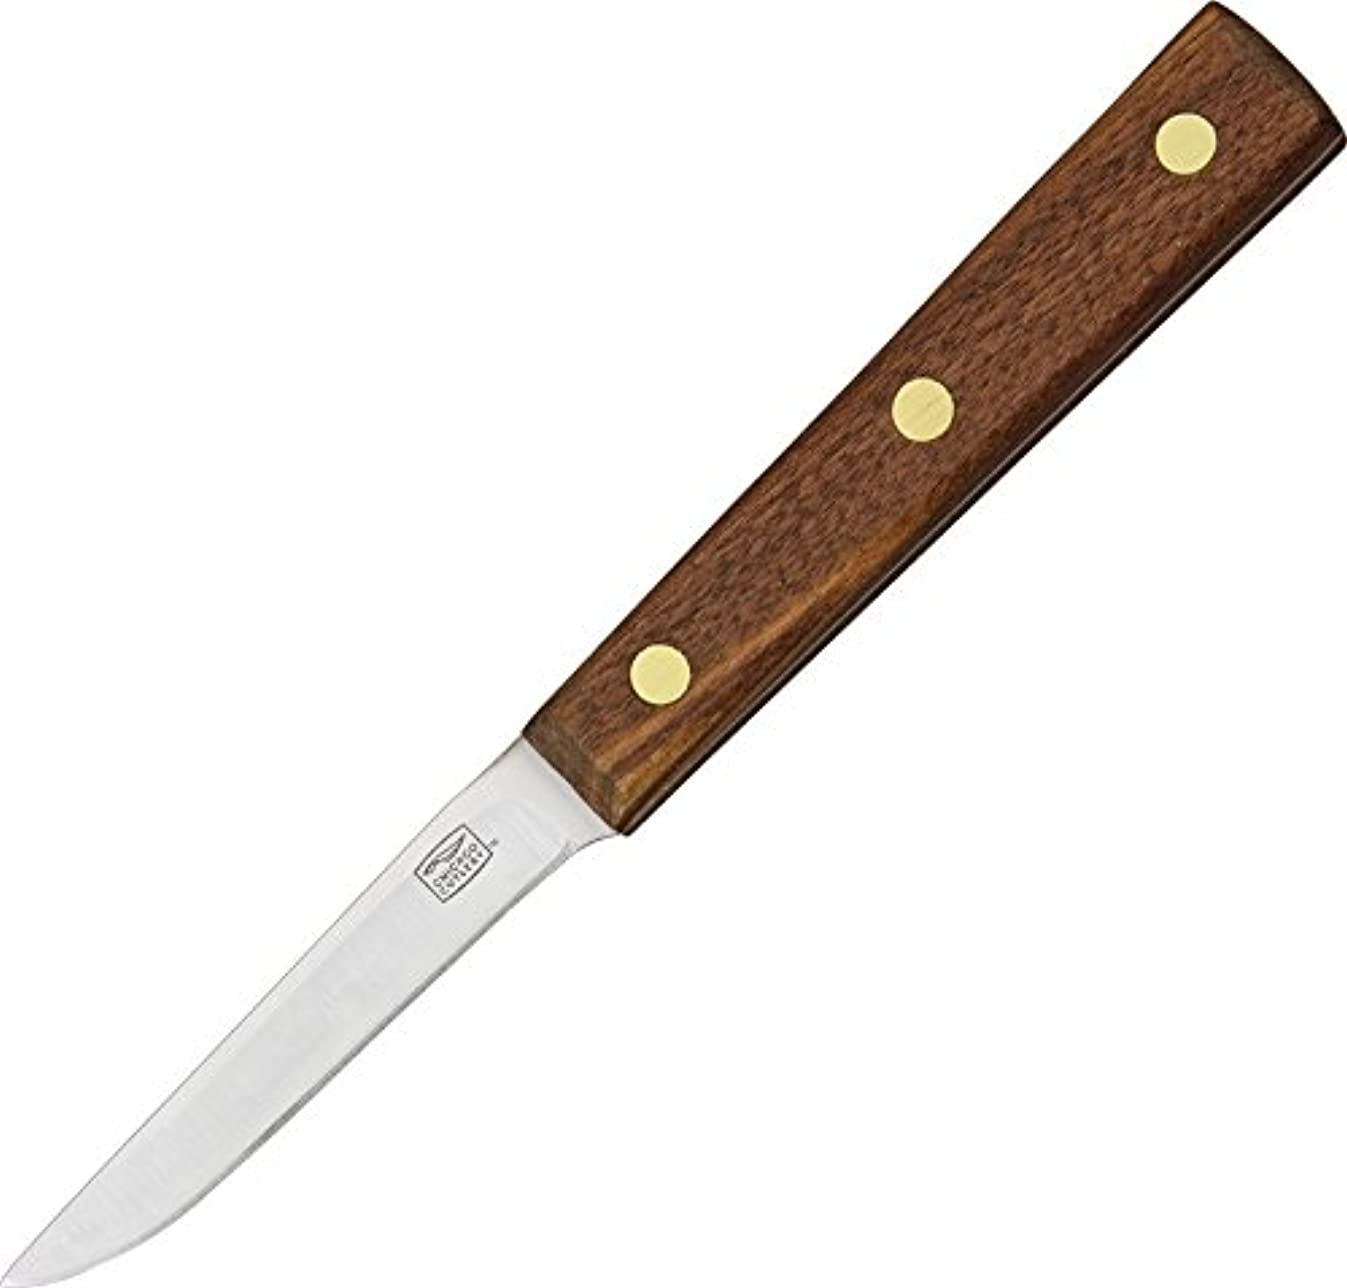 Chicago Cutlery 102SP Walnut Tradition 3-Inch Slant Tip Paring Knife